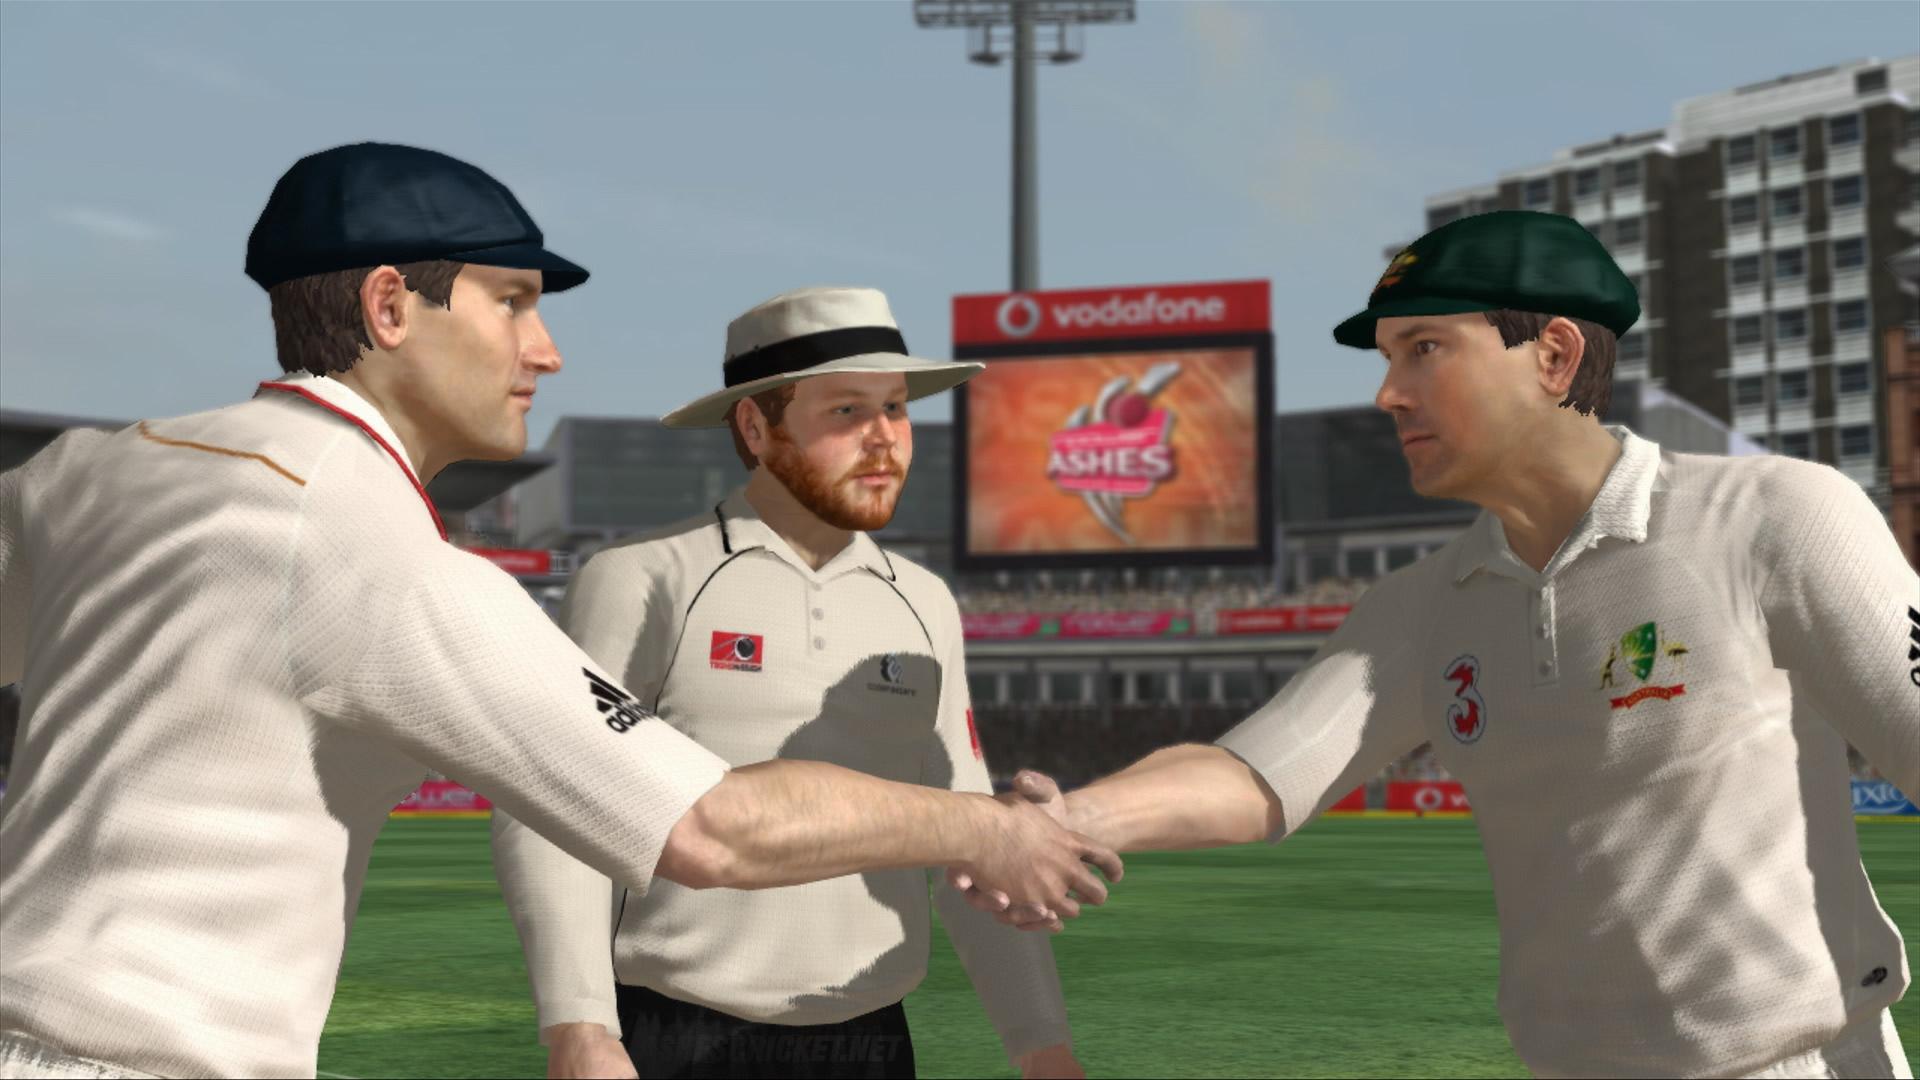 Ashes cricket 2009 no dvd crack download